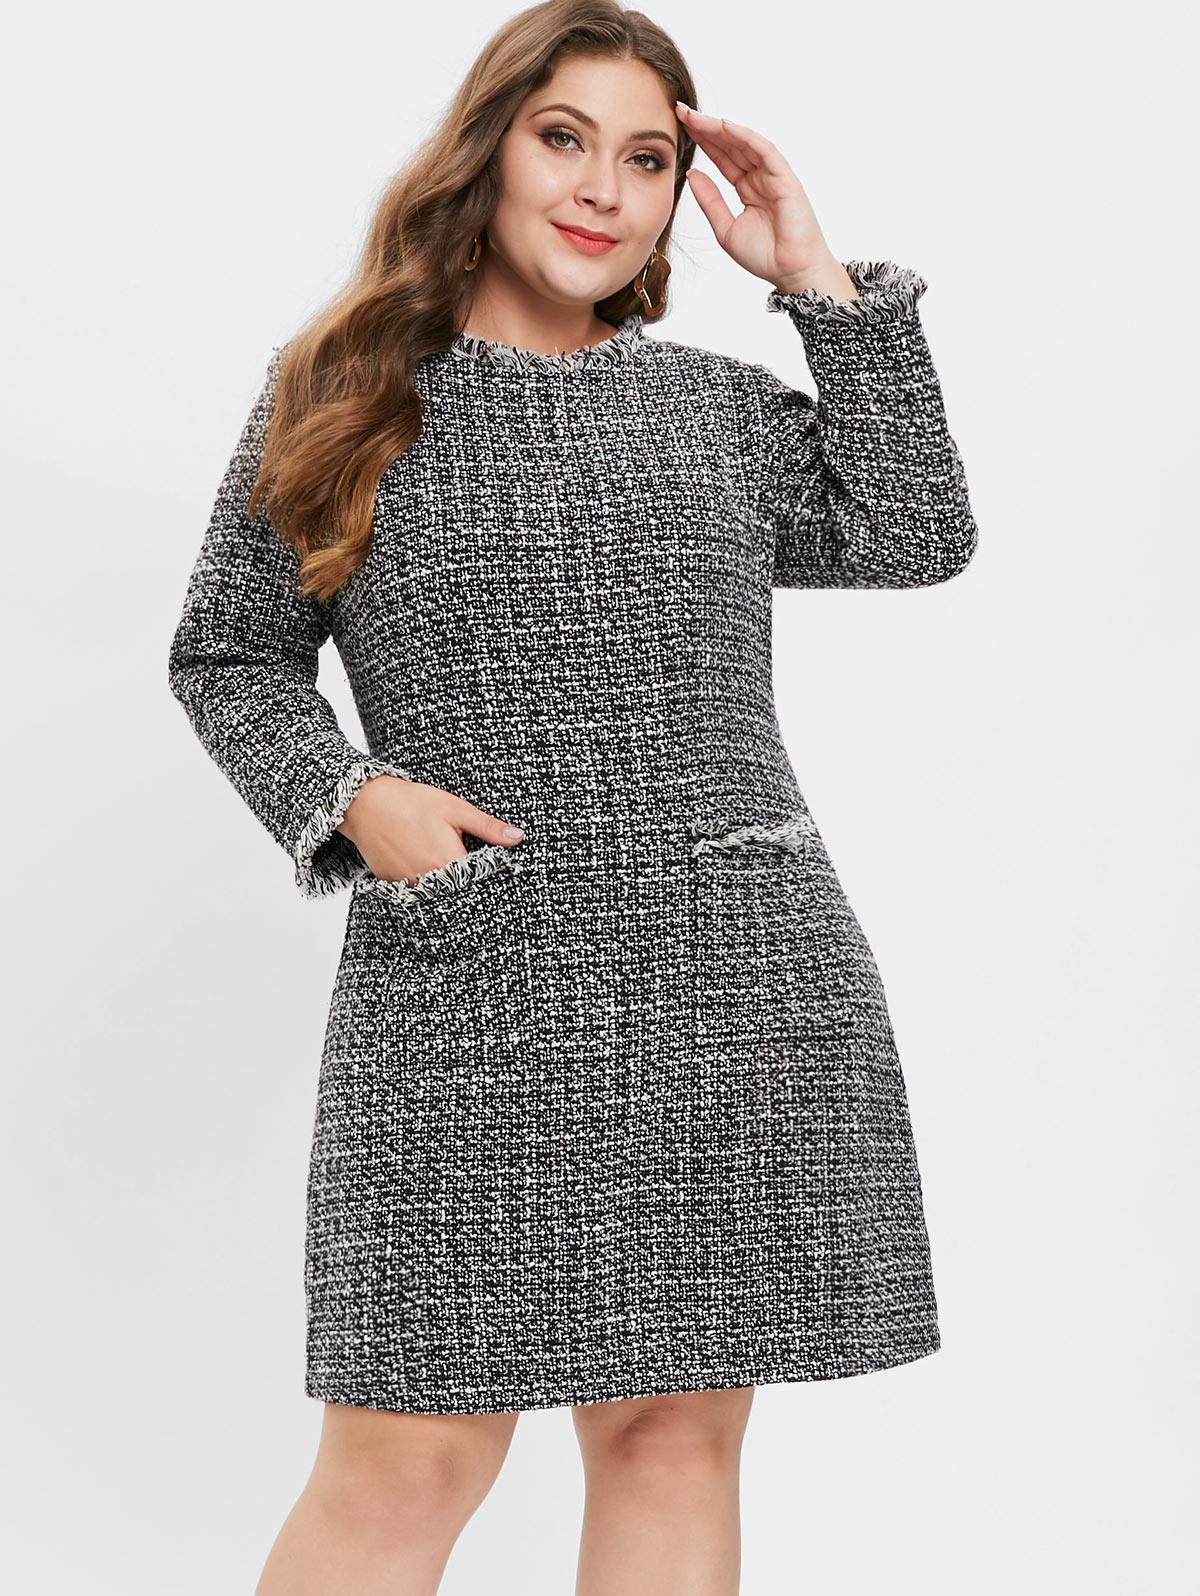 Heathered Plus Size Tweed Dress